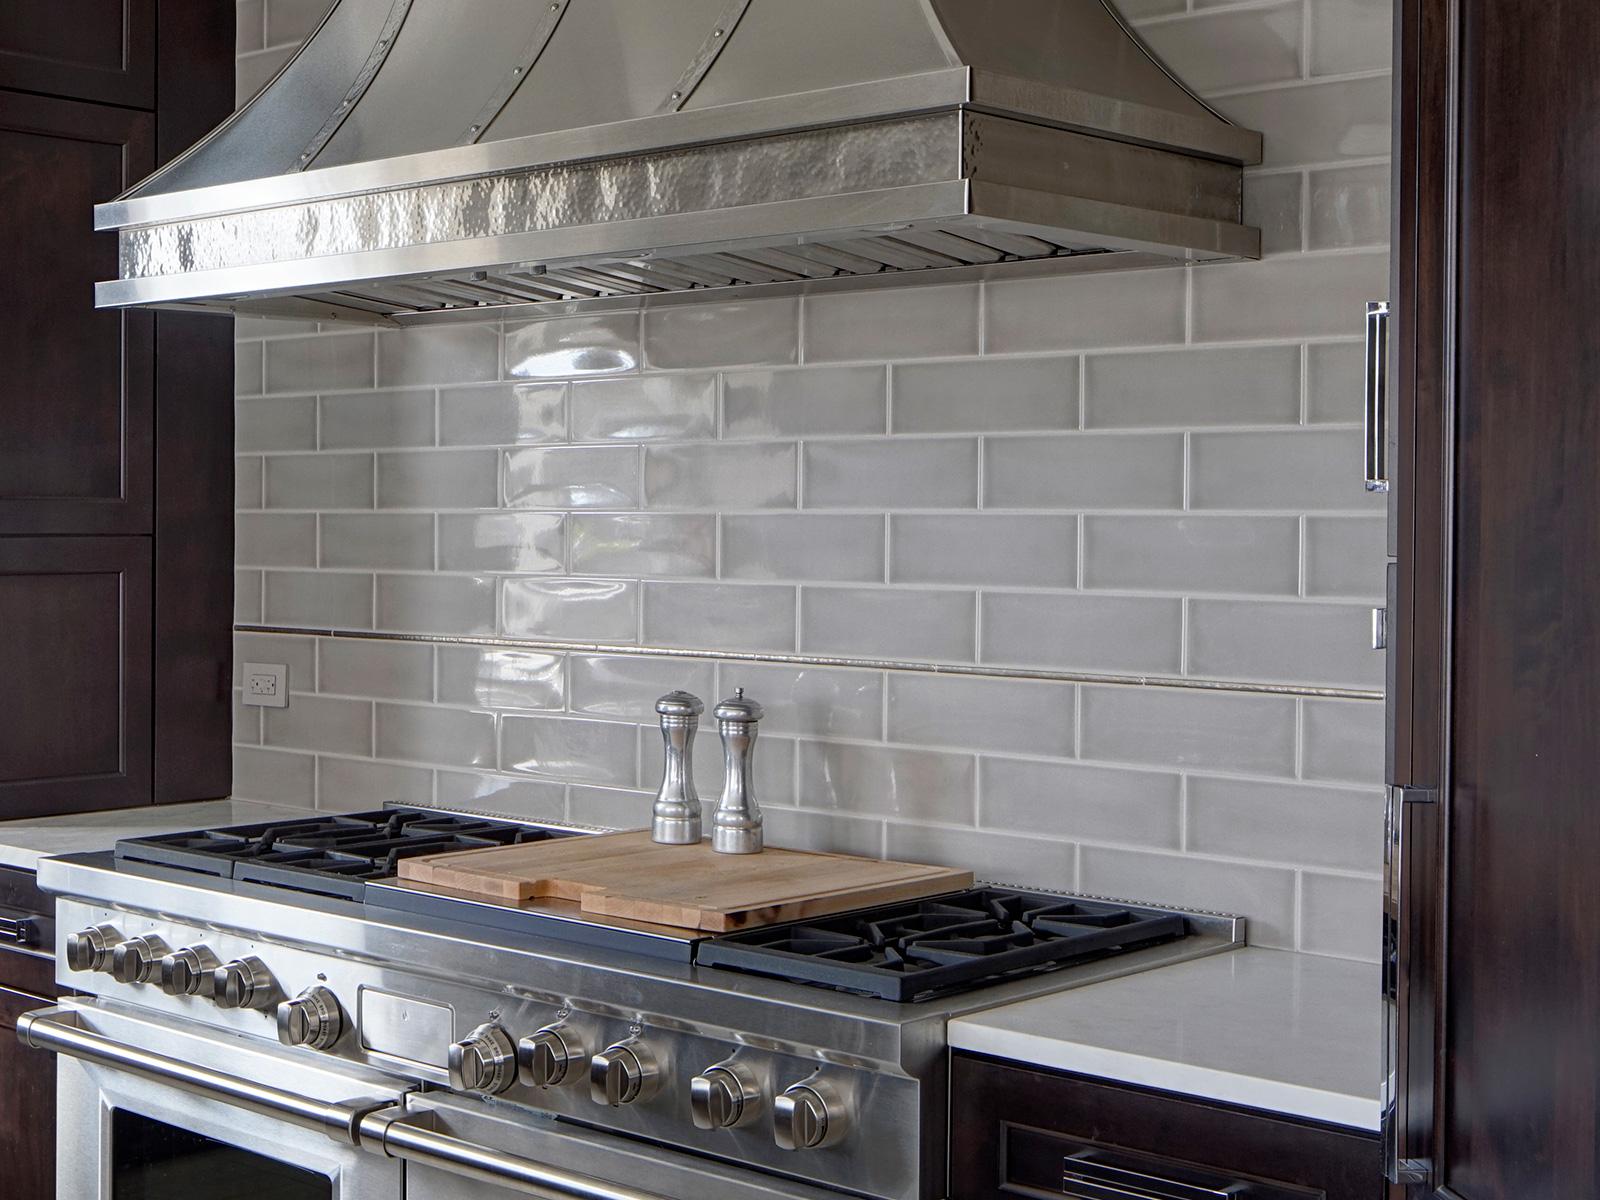 Bronzework Studio Gail Drury Design Basic Liner metal accent tile installation